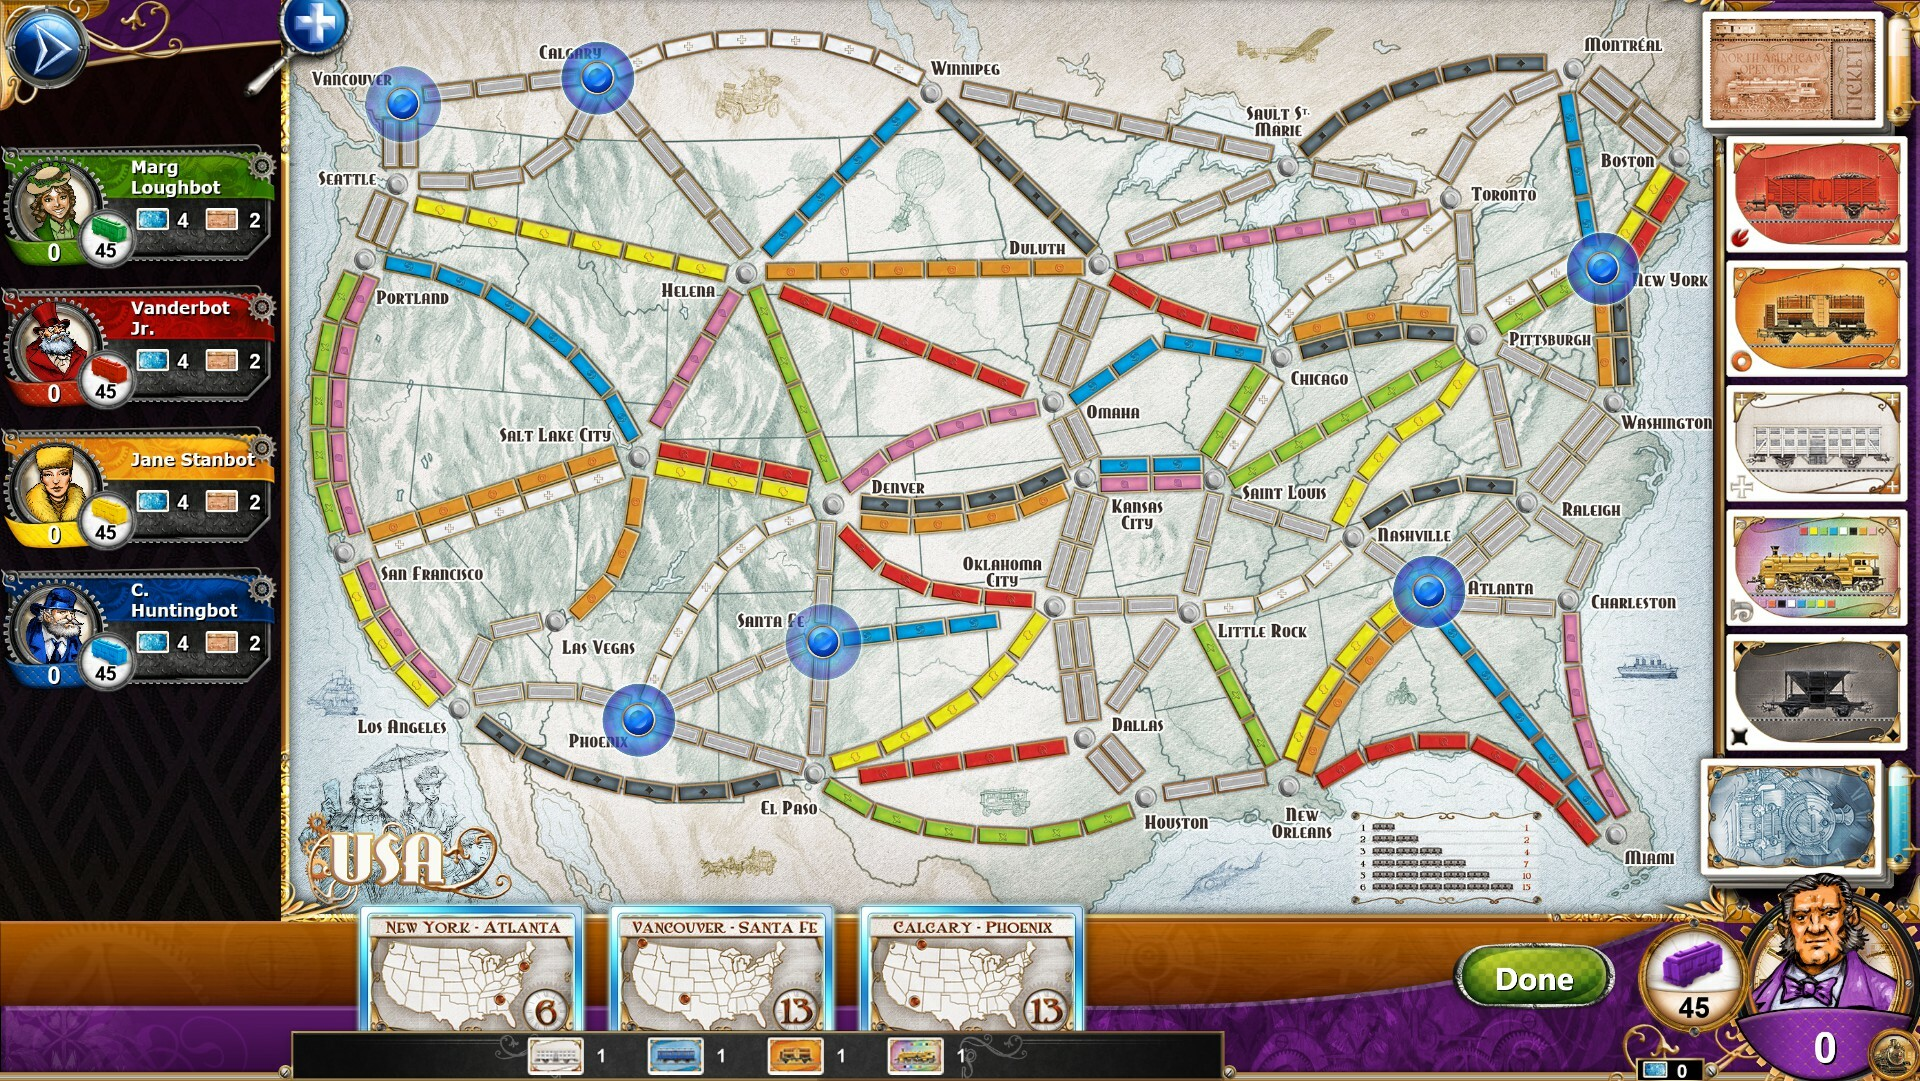 ticket-to-ride-pc-screenshot-01